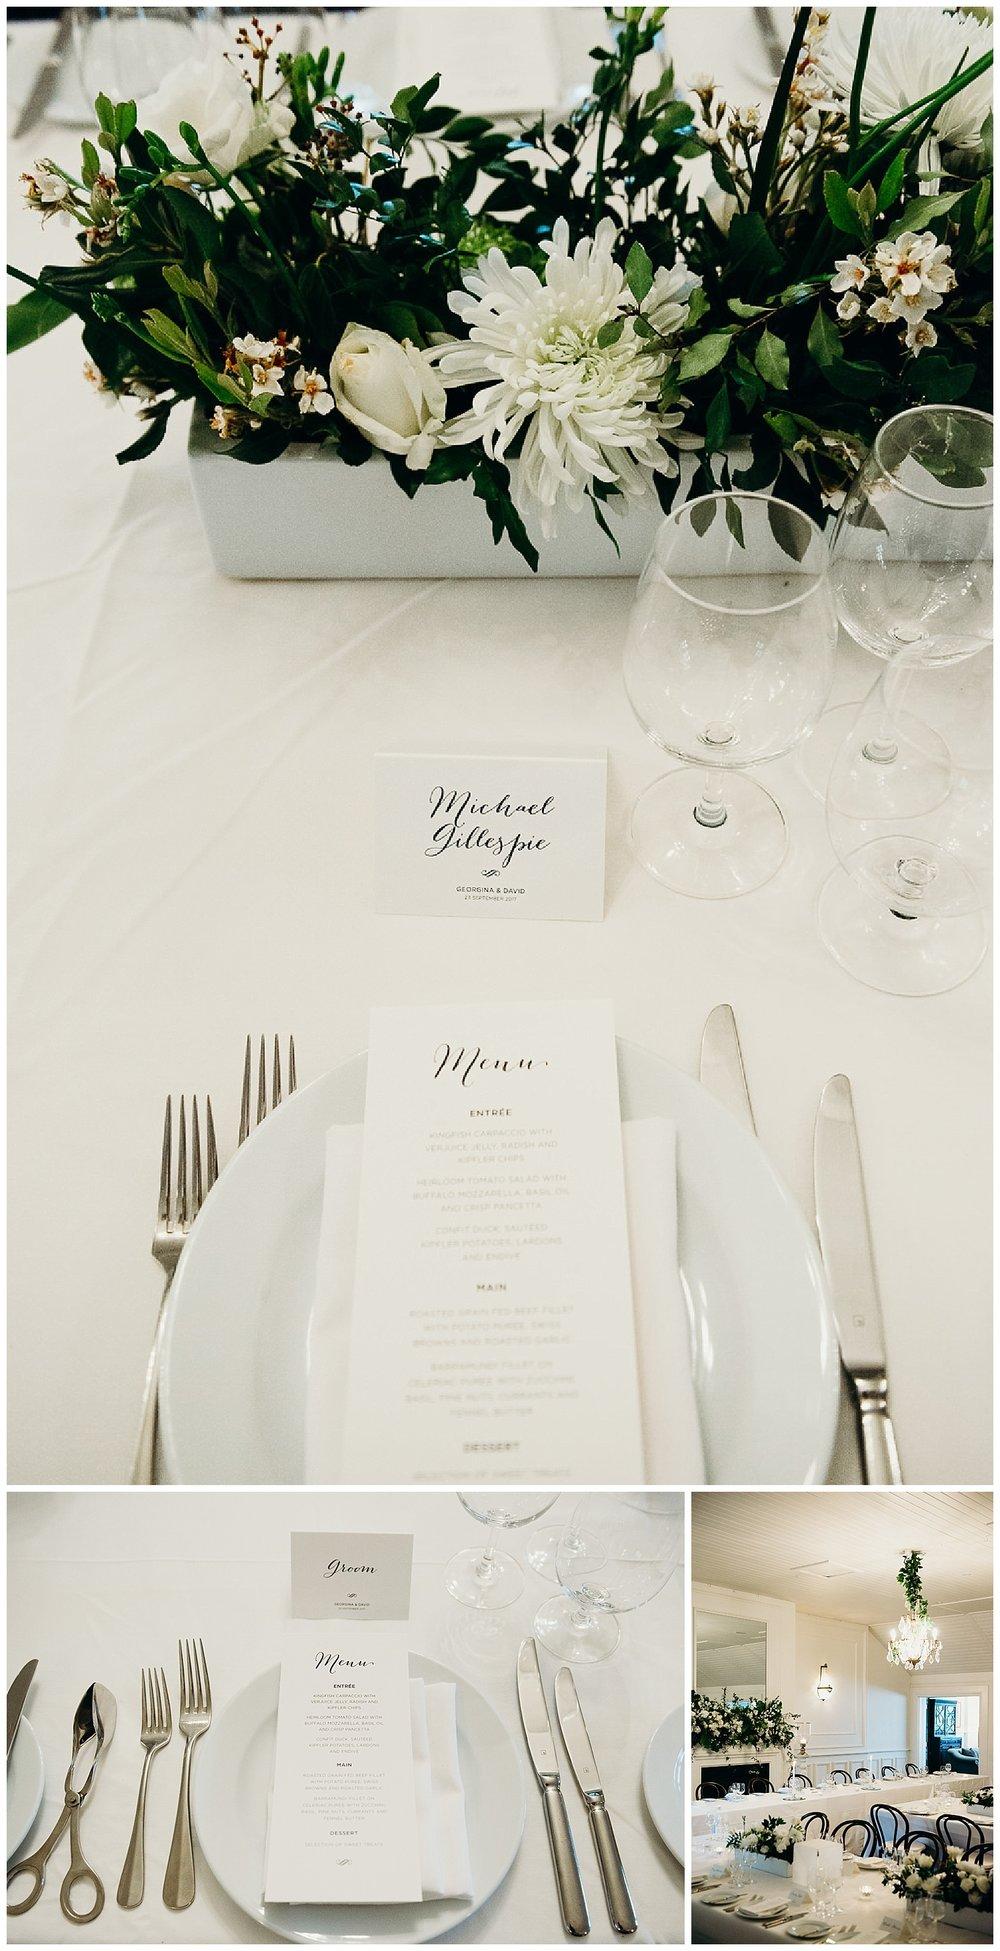 Zoe McMahon Photographer - Hopewood House - Wedding Day Photography - Georgie and David - Collage 26.jpg